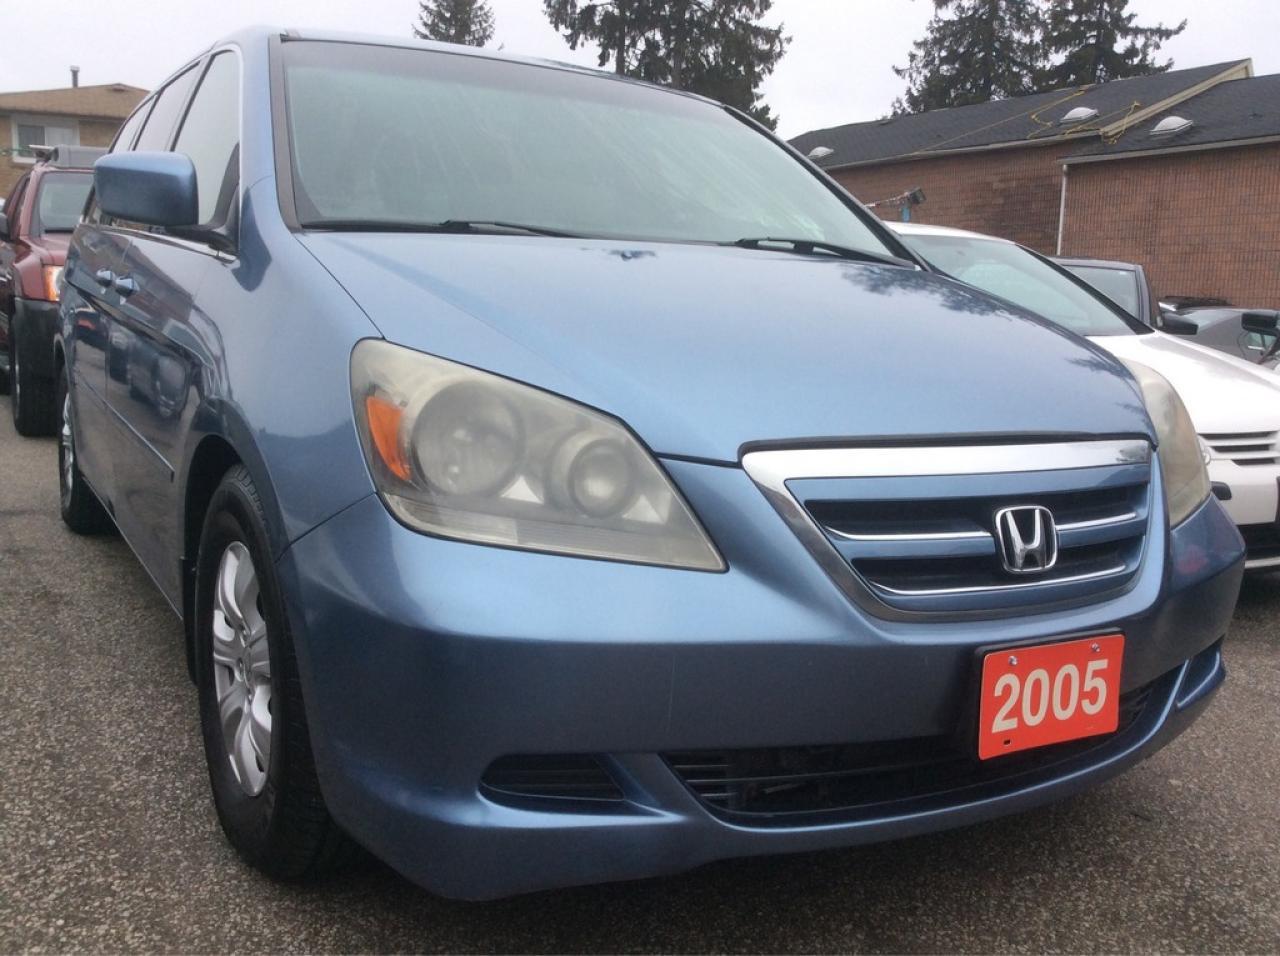 2005 Honda Odyssey MUST SEE ! 8 Pass Power Sliding Doors Alloys